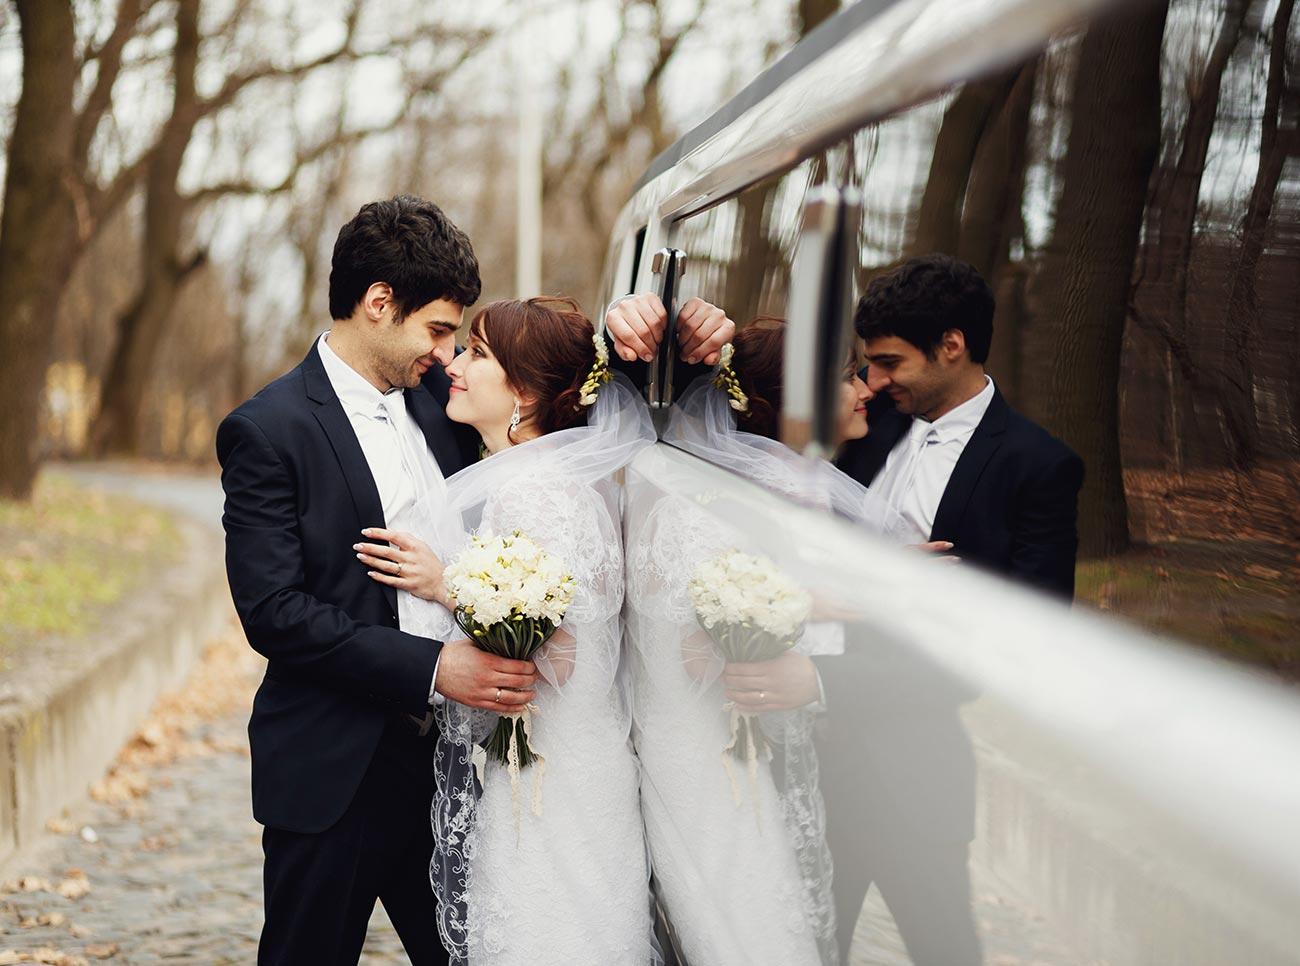 LI Wedding SUV and Unique Limos